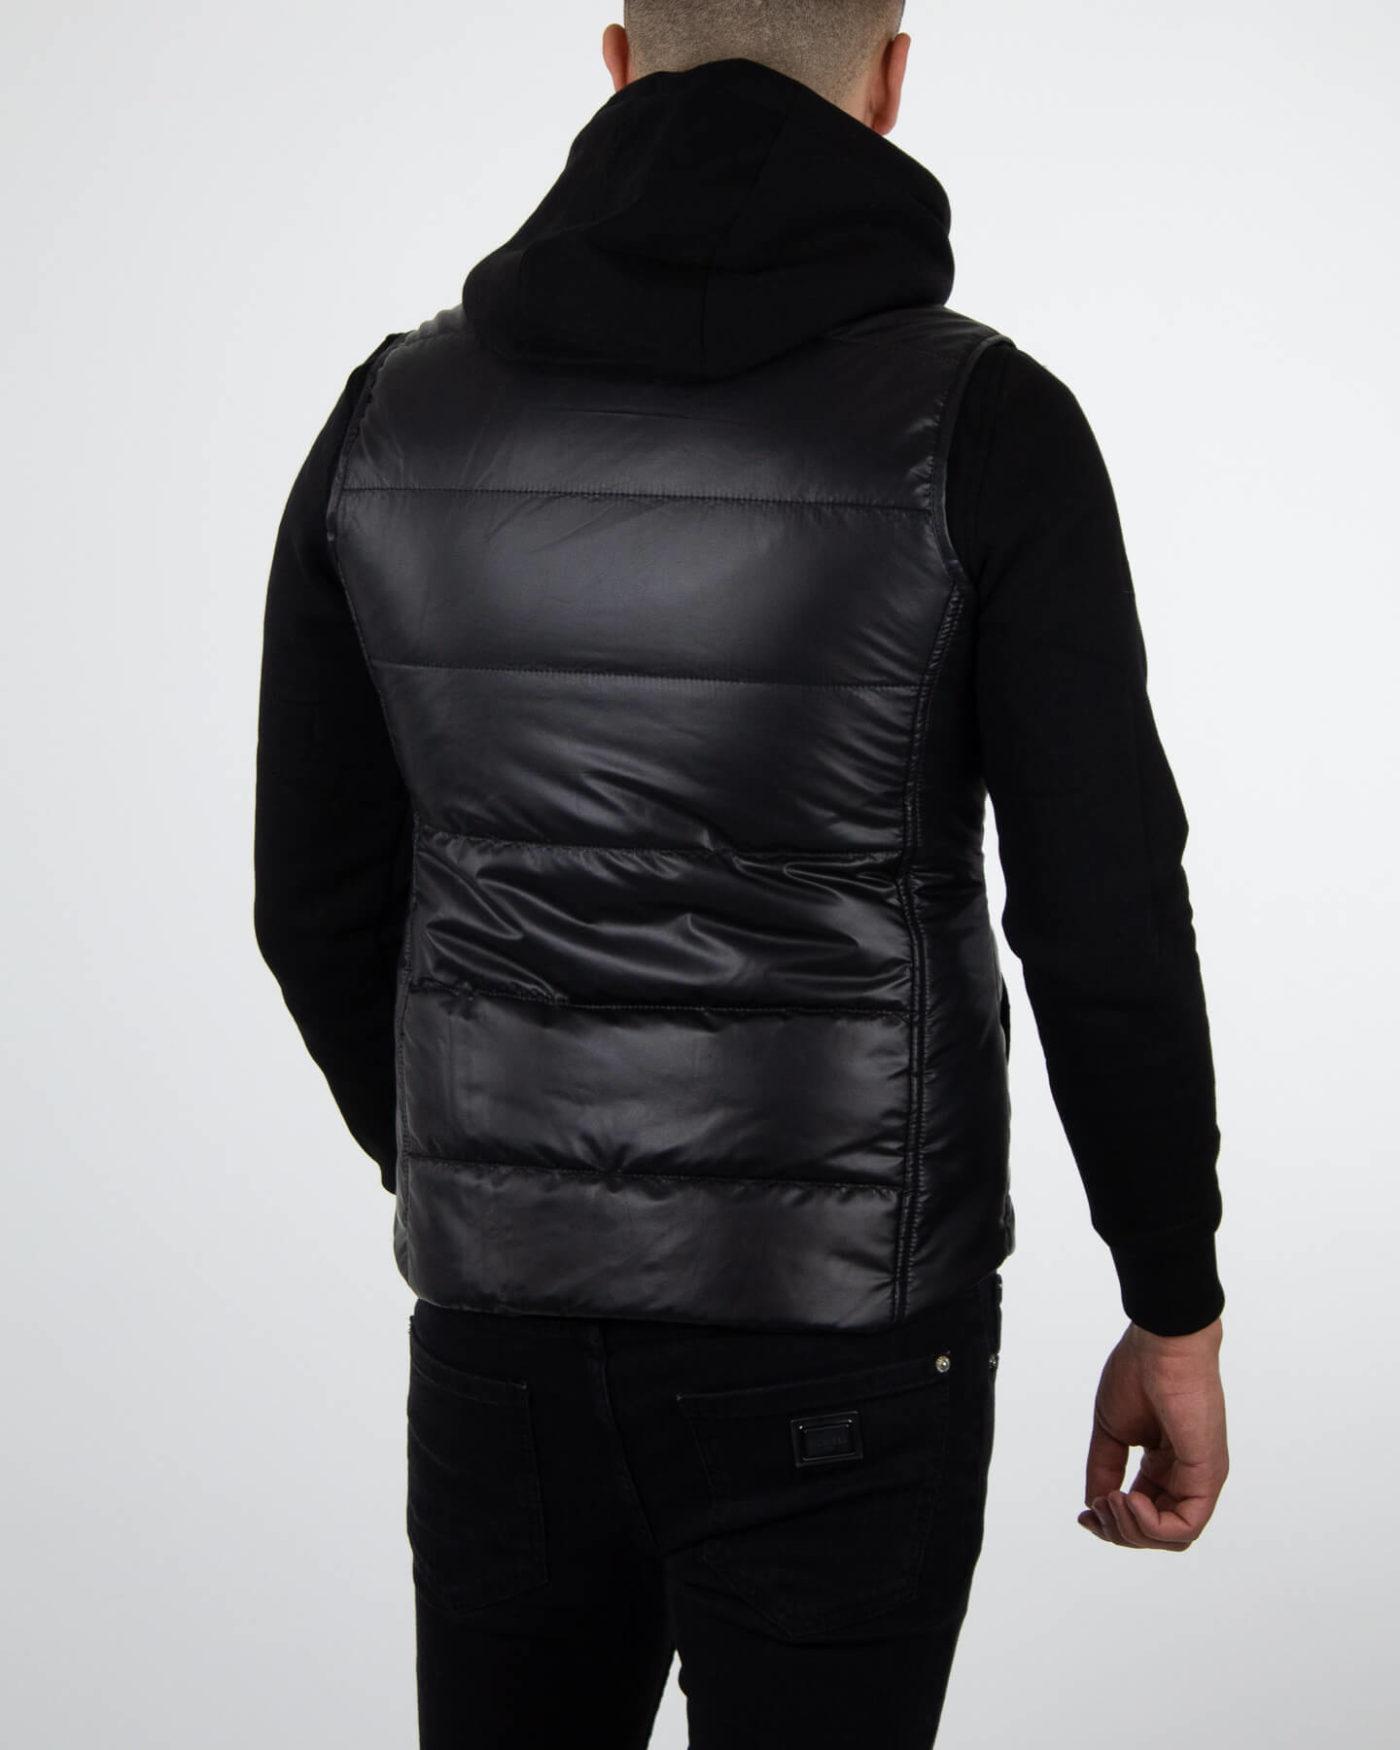 Richesse Deluxe Bodywarmer Black-4